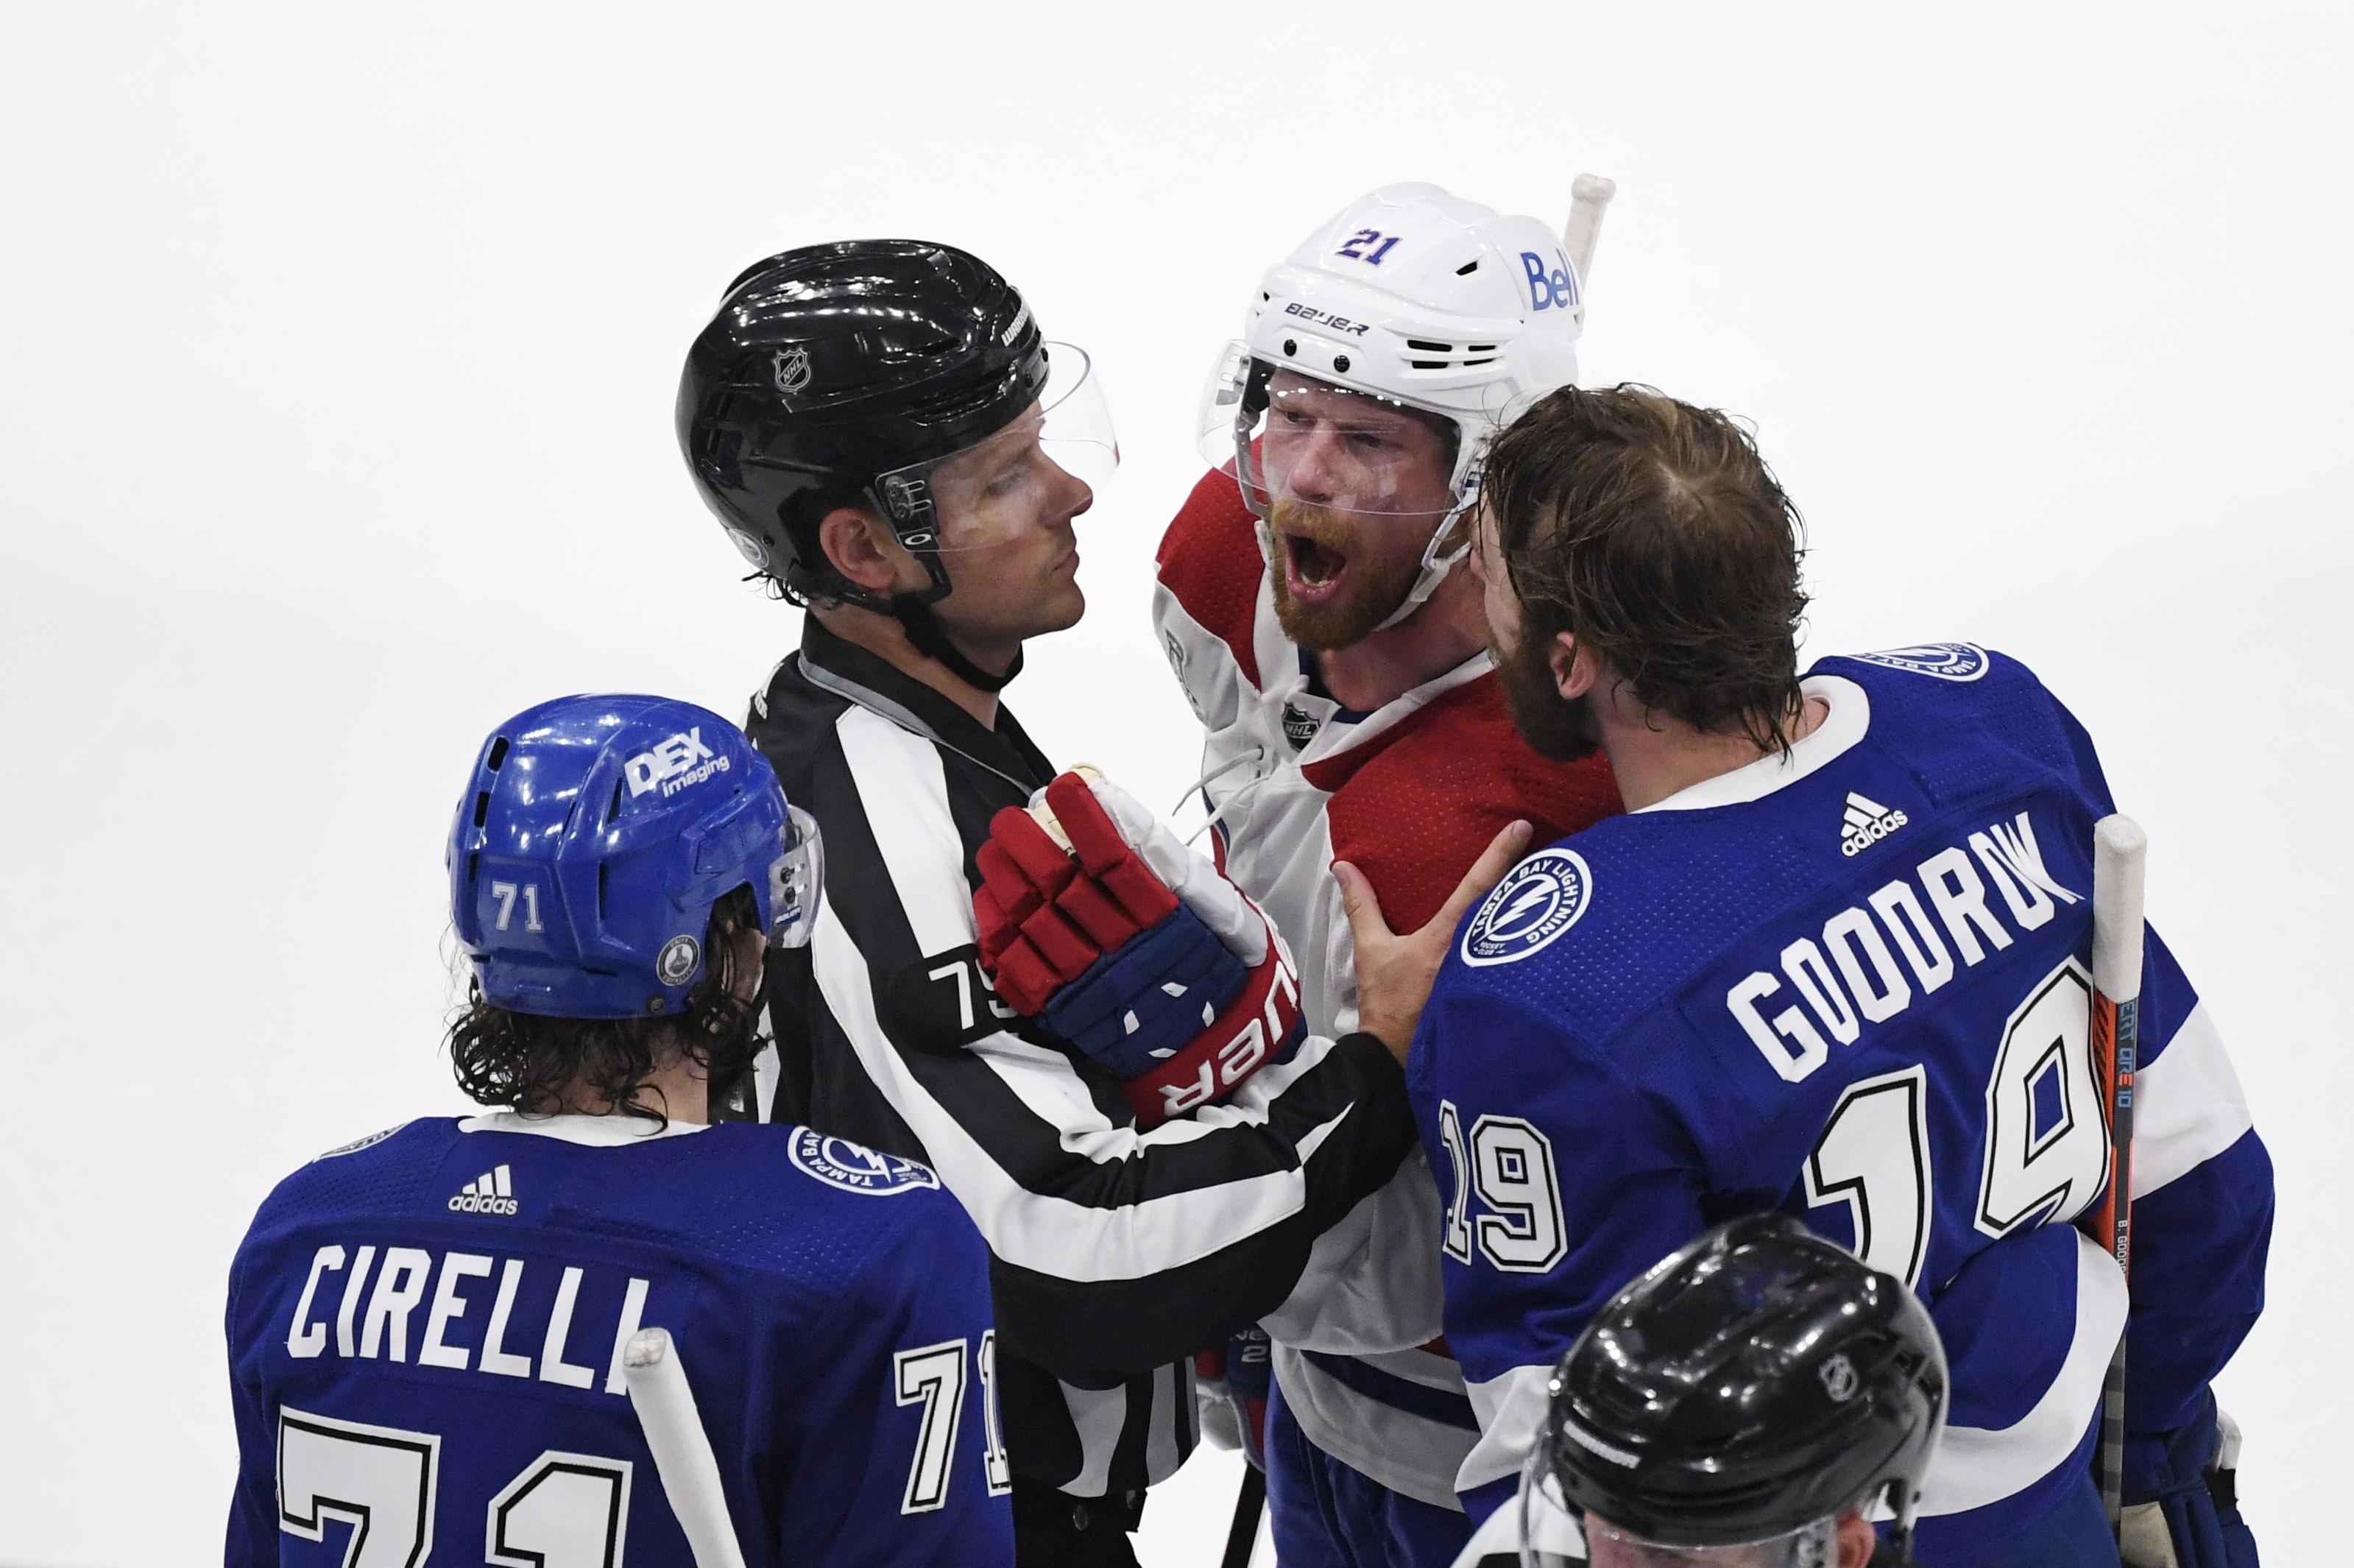 Montreal Canadiens versus Tampa Bay Lightning present unique Stanley Cup Finals